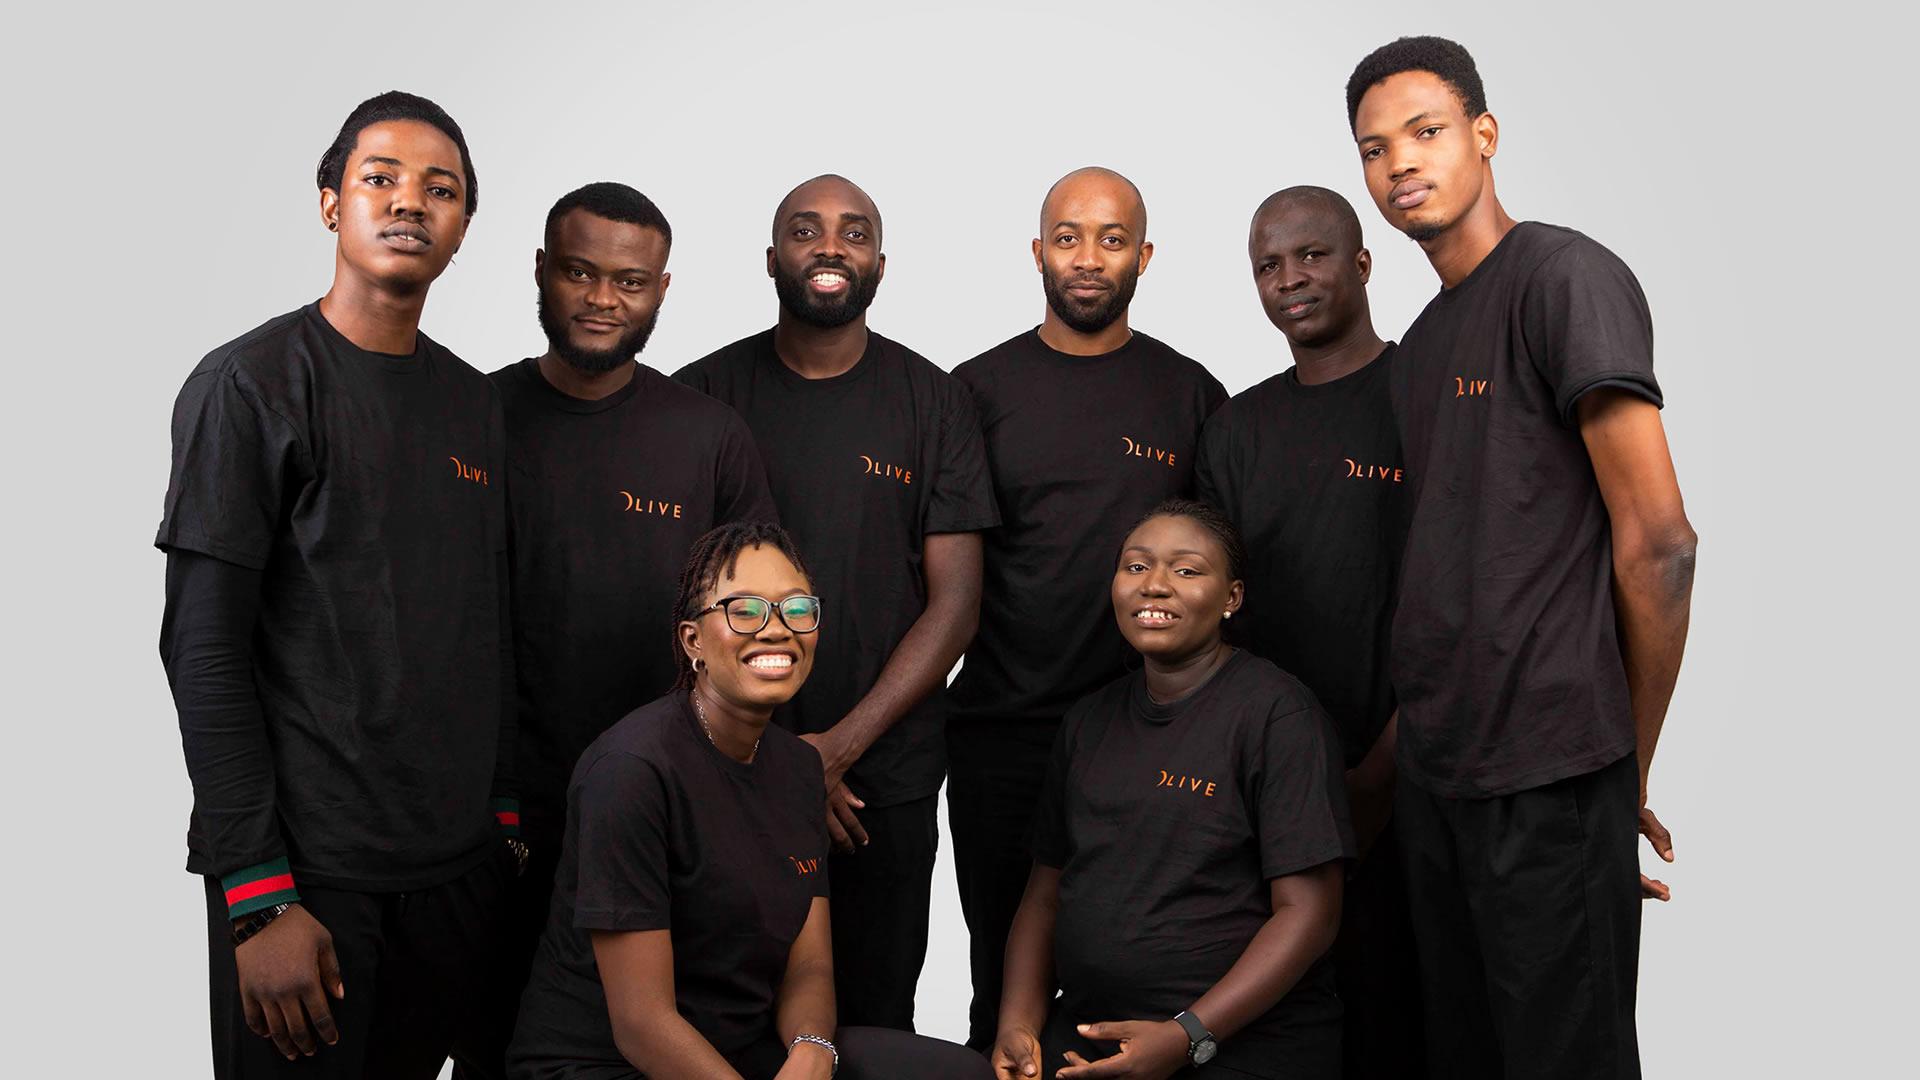 Eclipse Live Africa Team